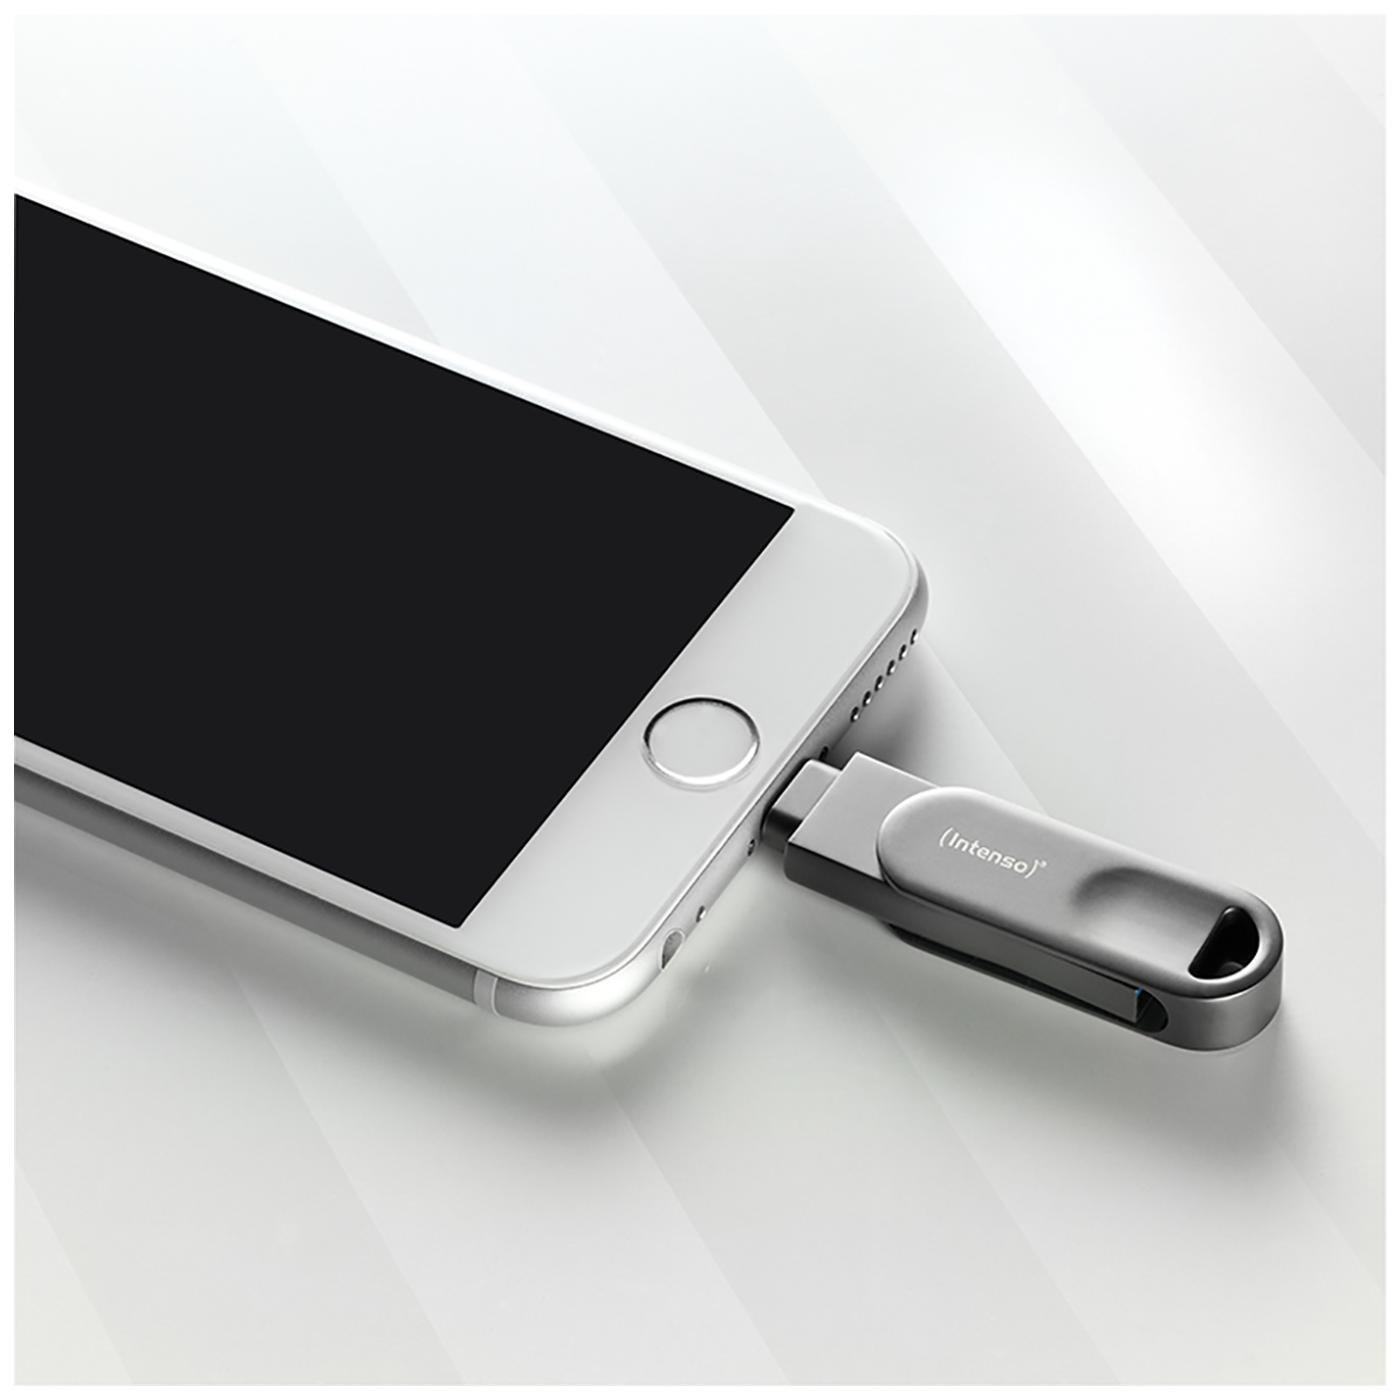 BULK-USB3.0-32GB/iMobile Line Pro